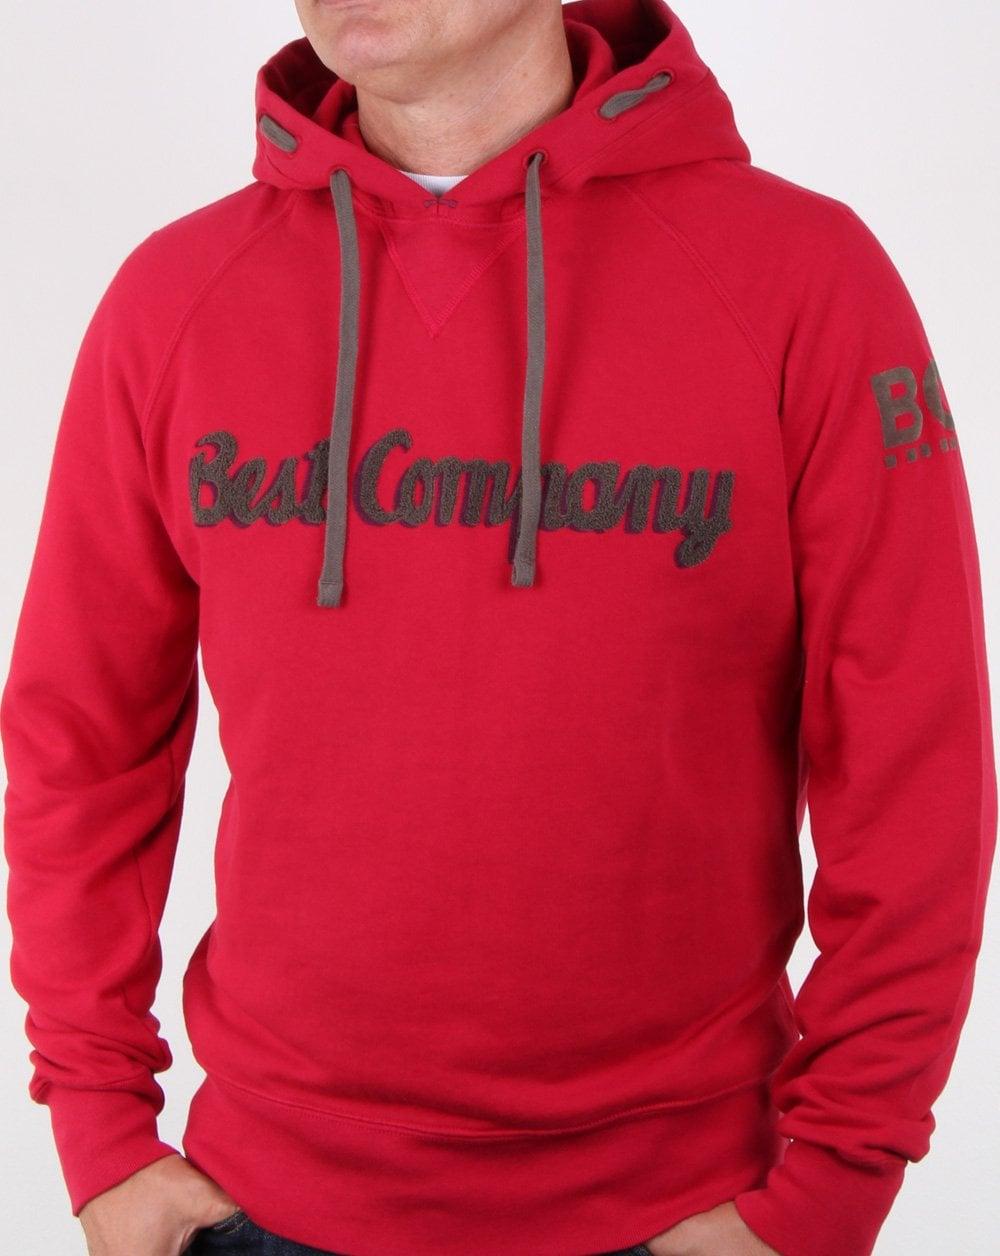 Best Company Hoody